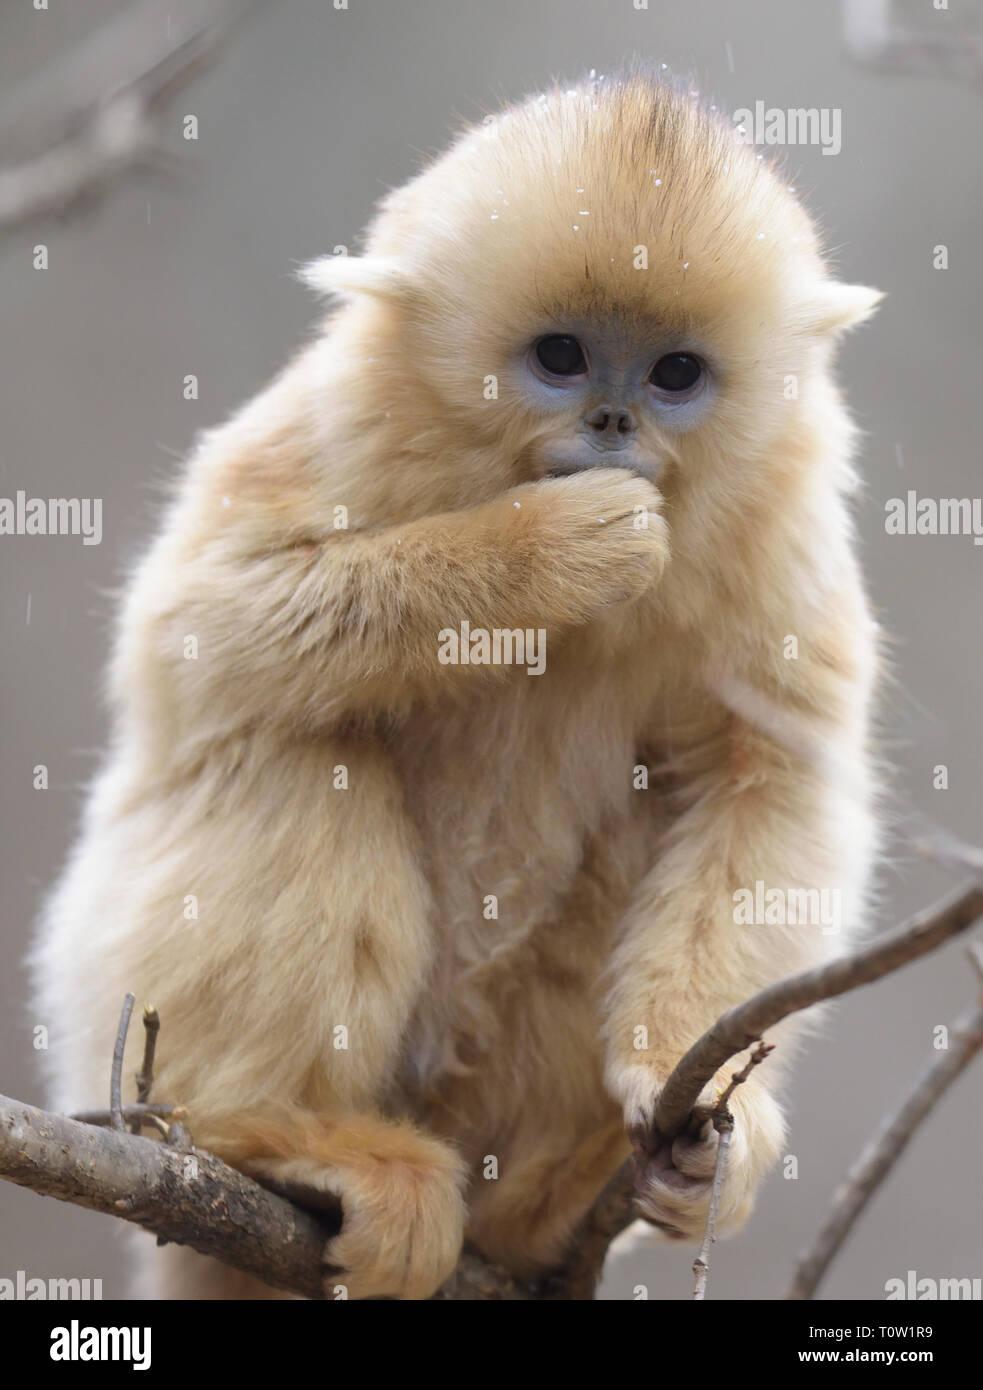 Cute baby Golden Snub-nosed Monkey (Rhinopithecus roxellana) - Stock Image